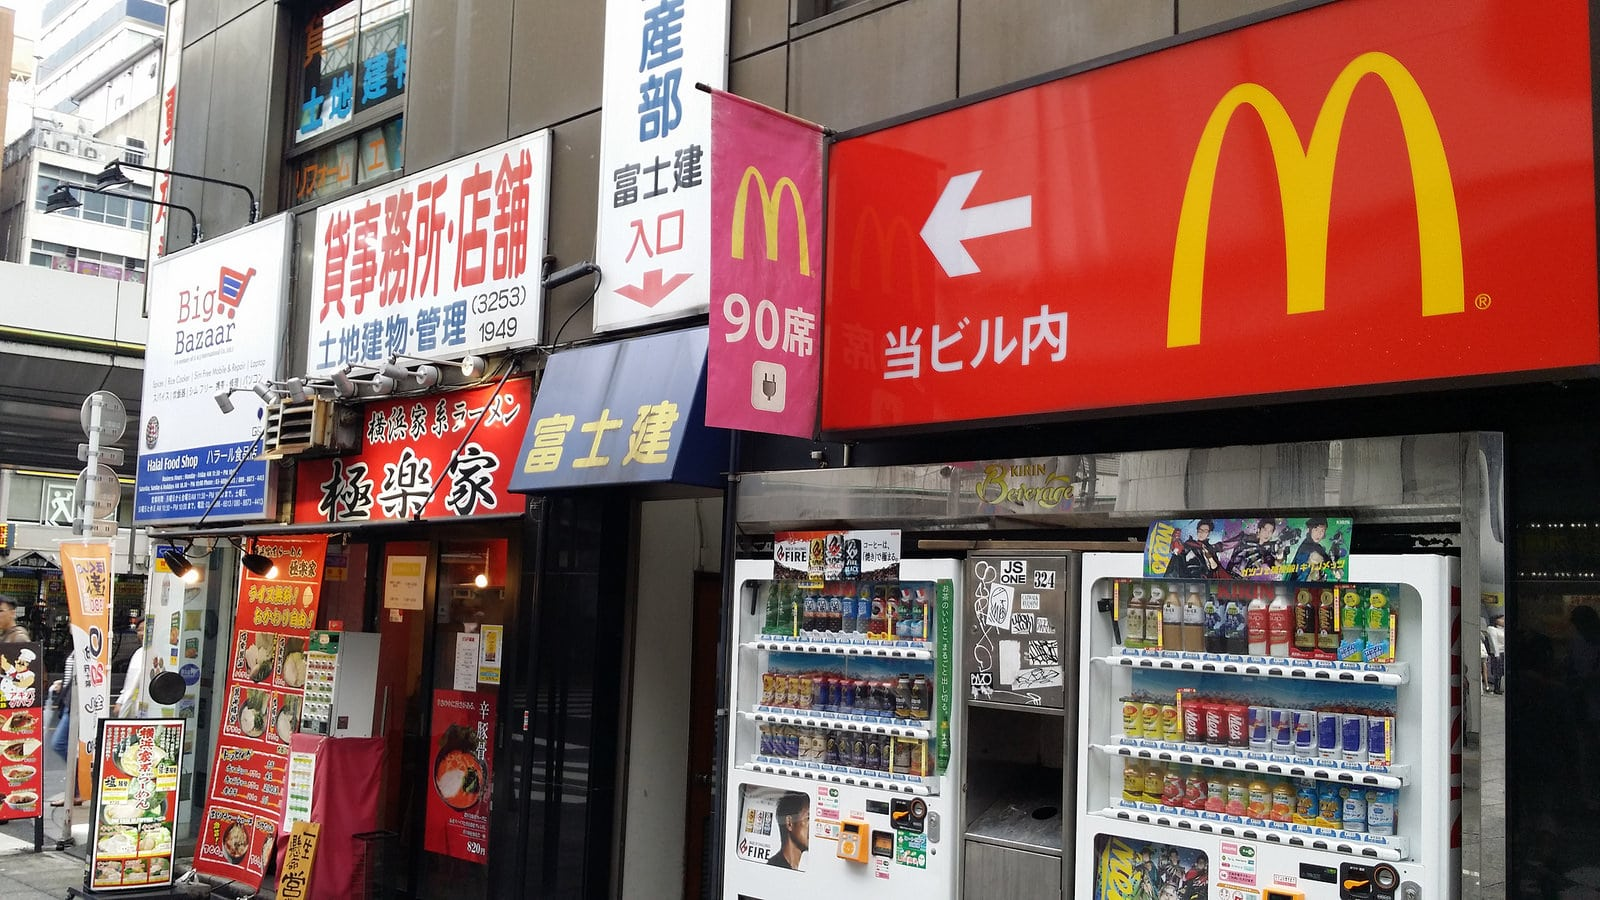 Stores along Akibara, Tokyo